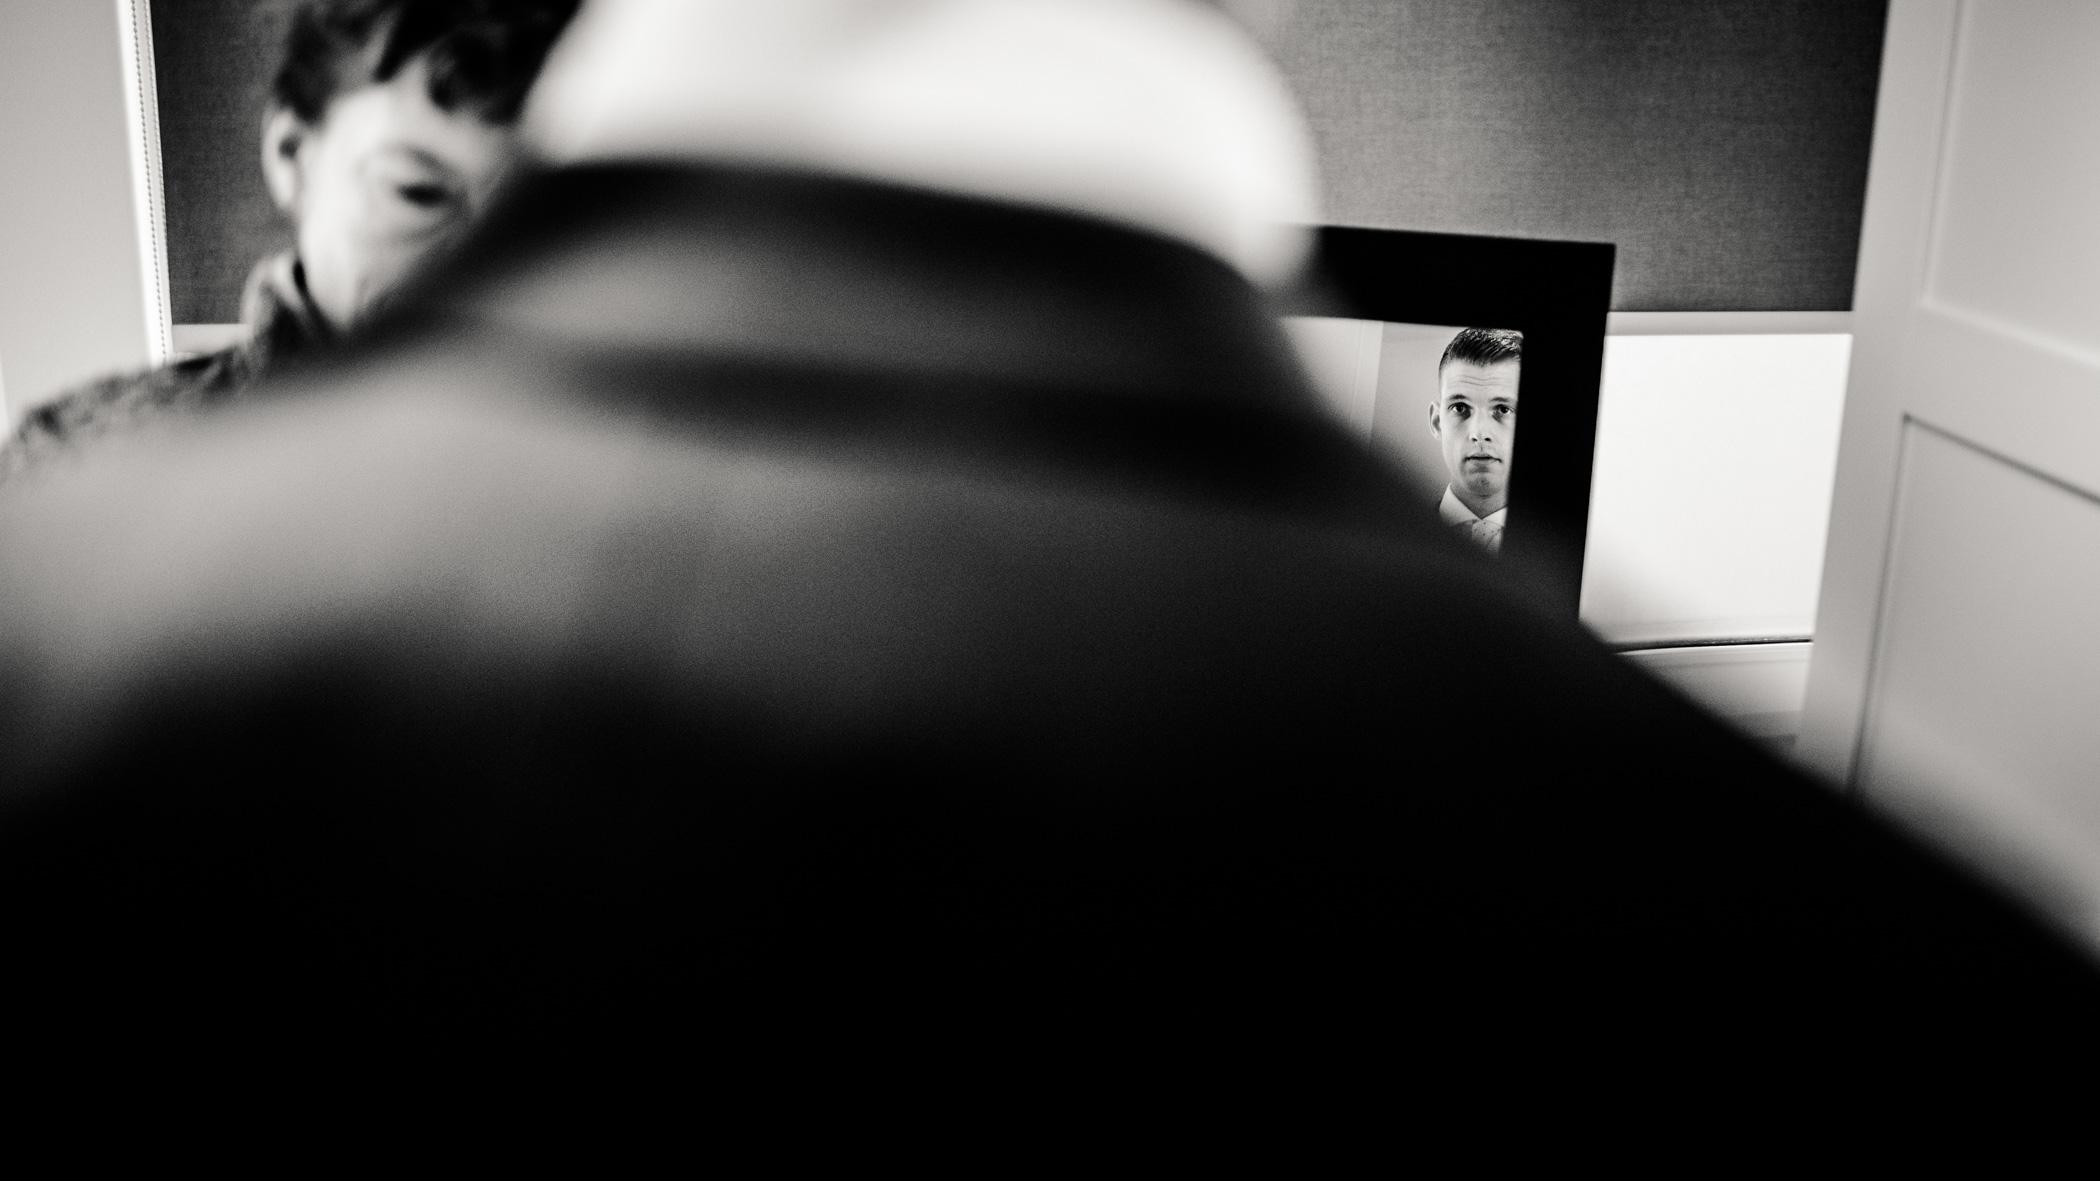 Spiegel bruidegom